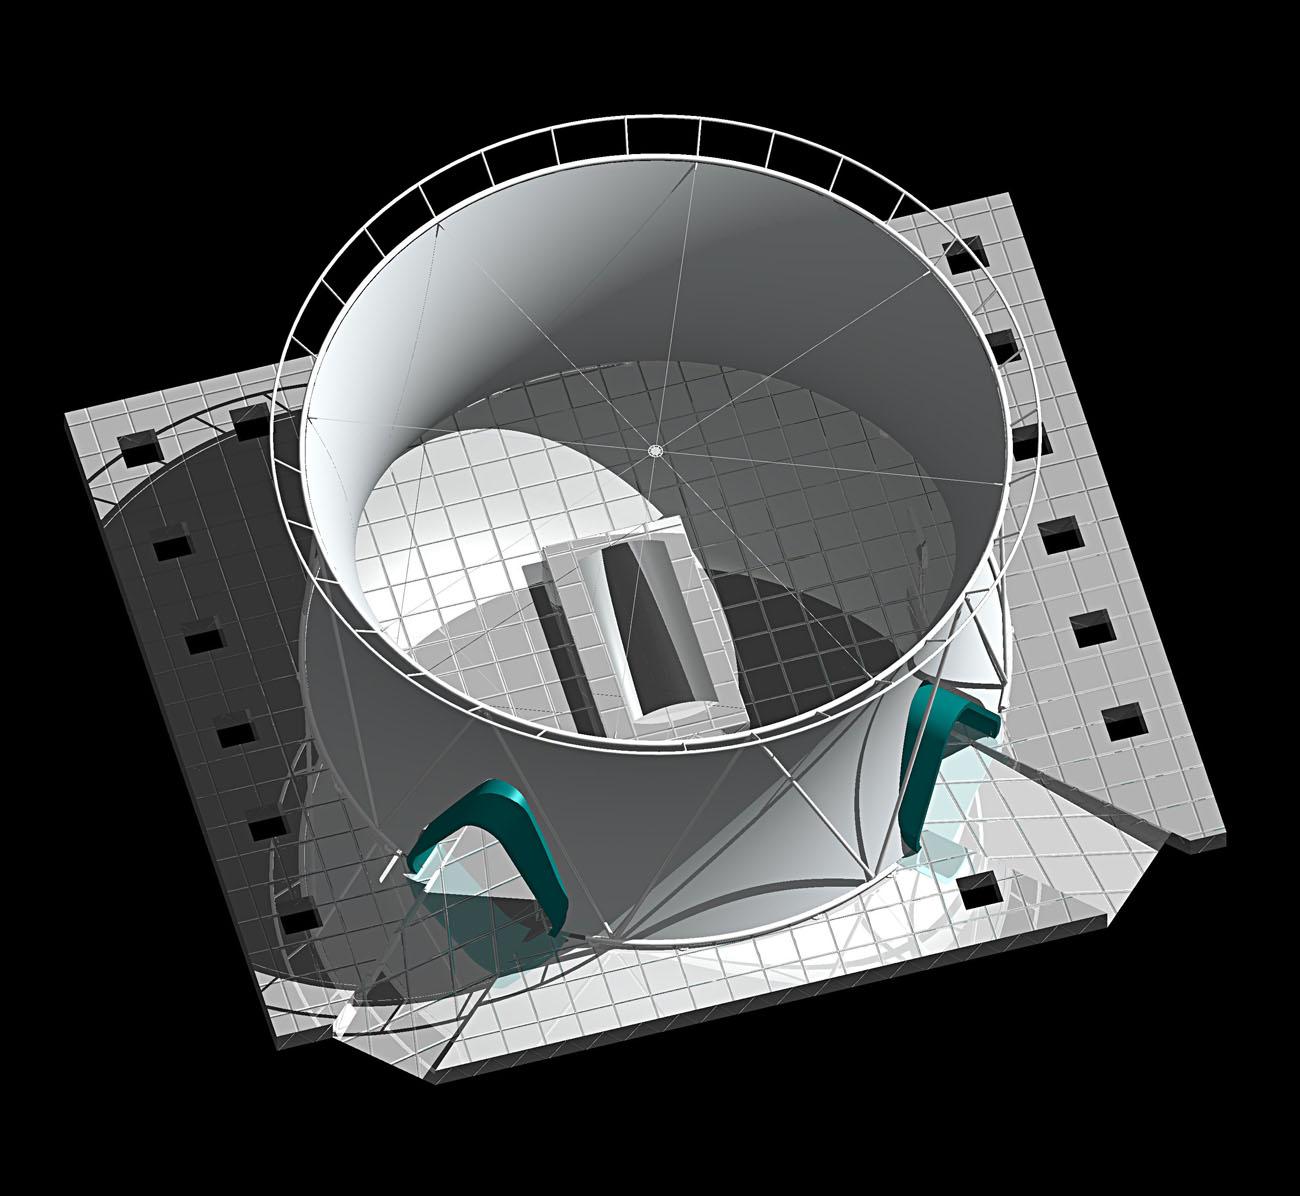 alumasc interbuild axonometric by Marks Barfield Architects